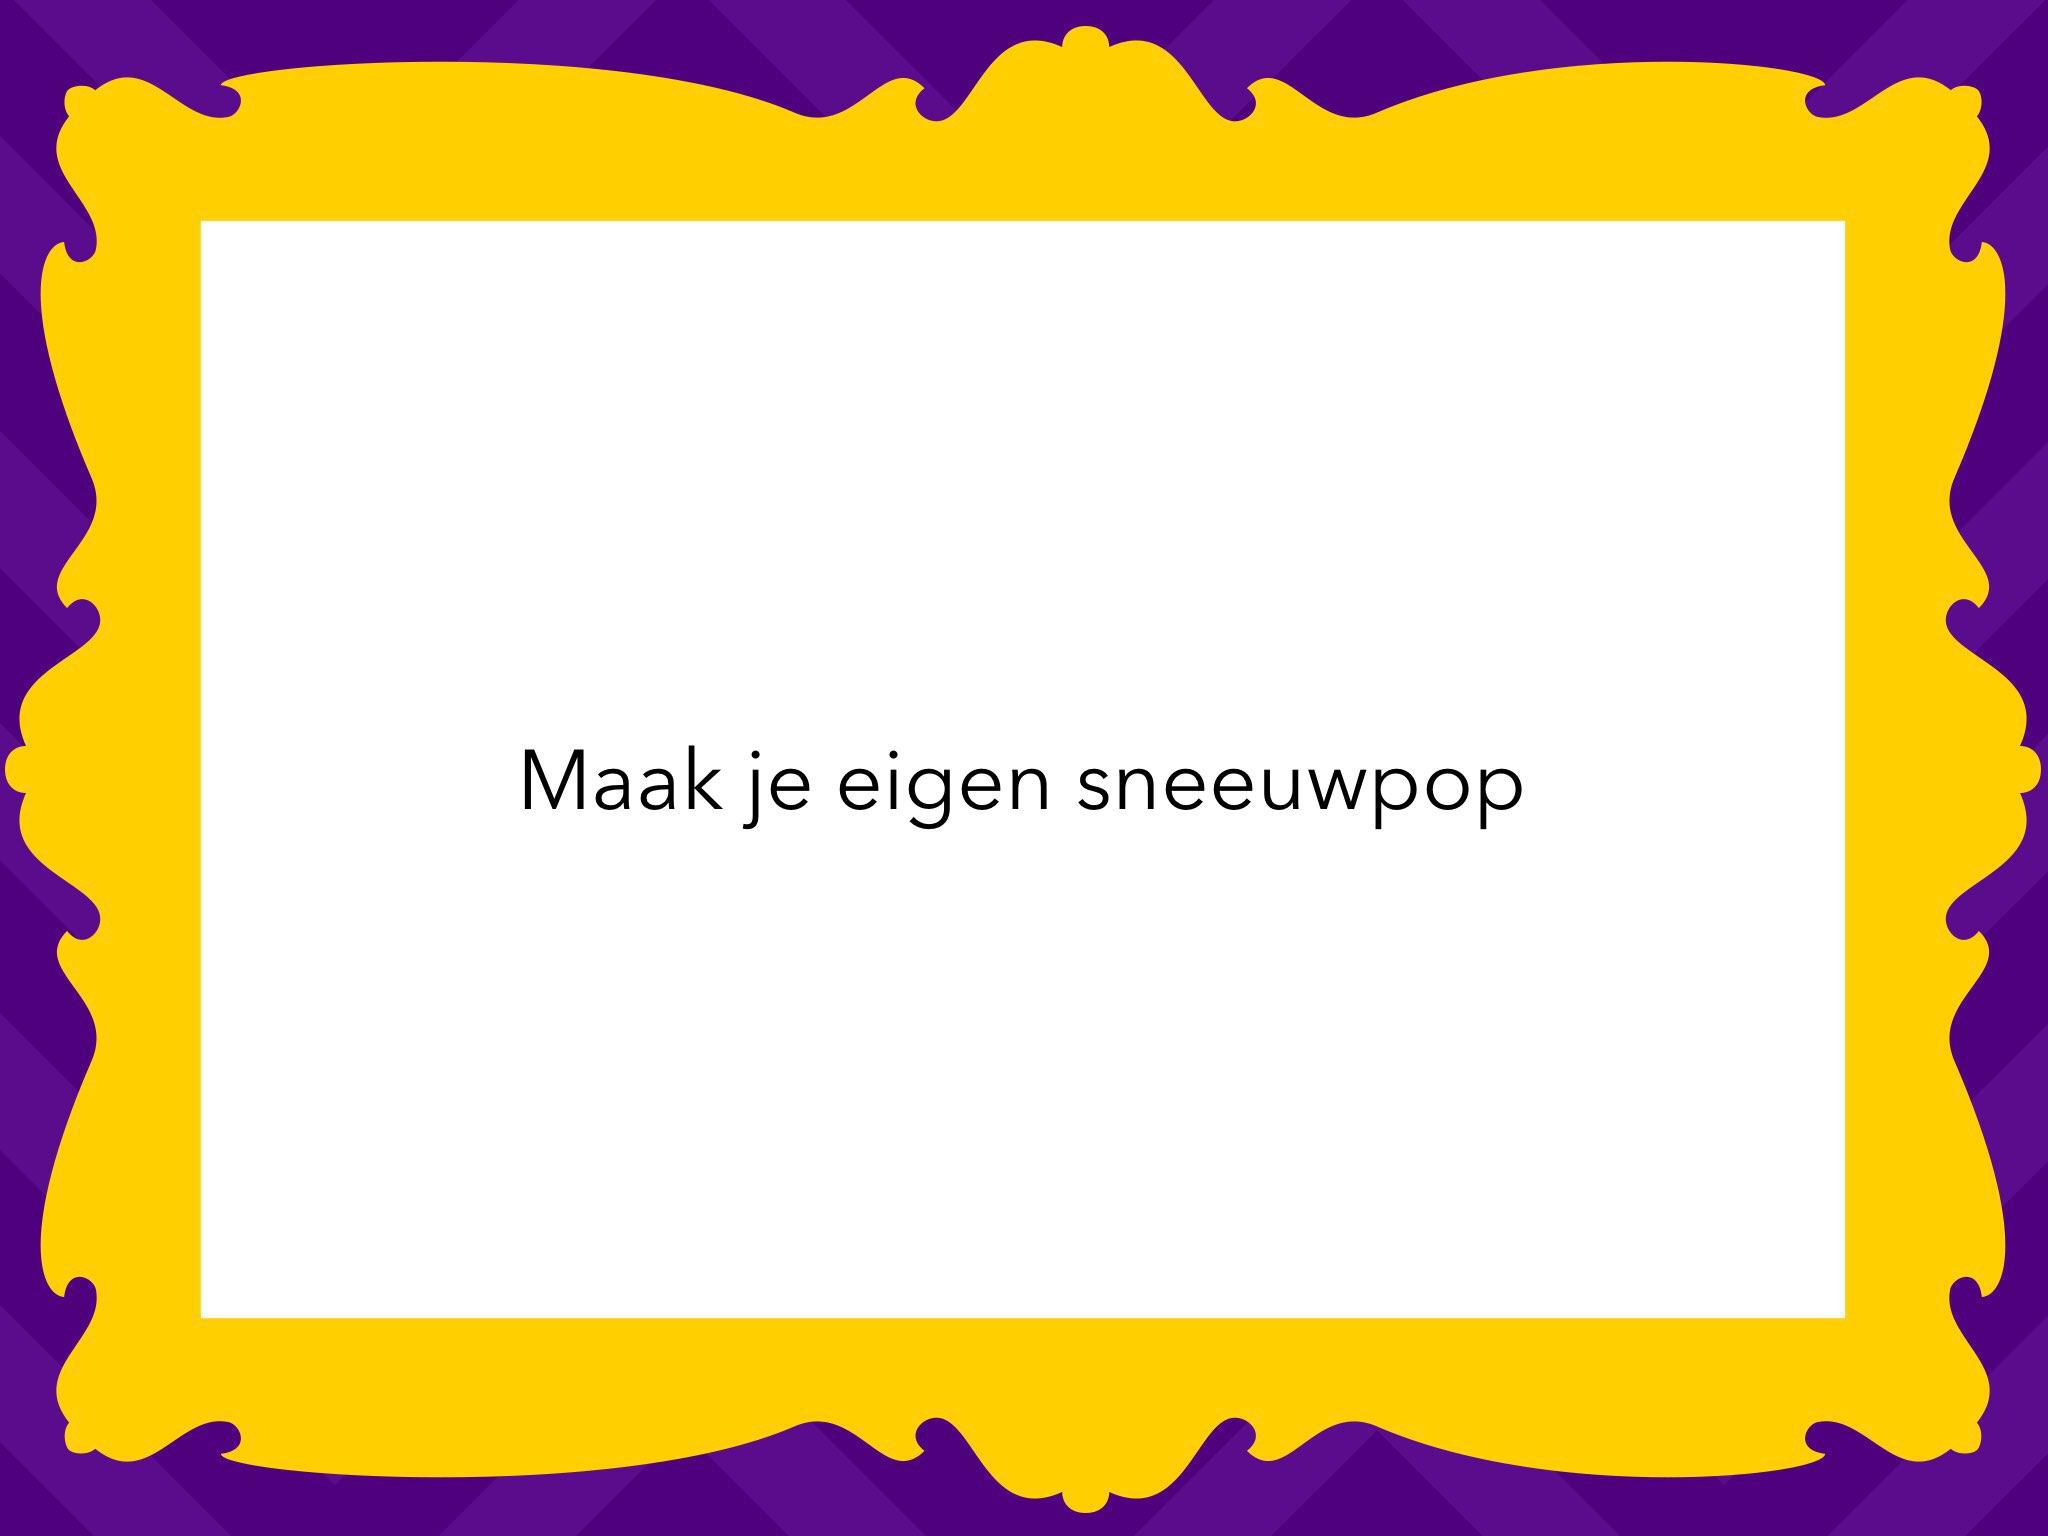 Maak Je Eigen Sneeuwpop By Esmee Van Munsteren Educational